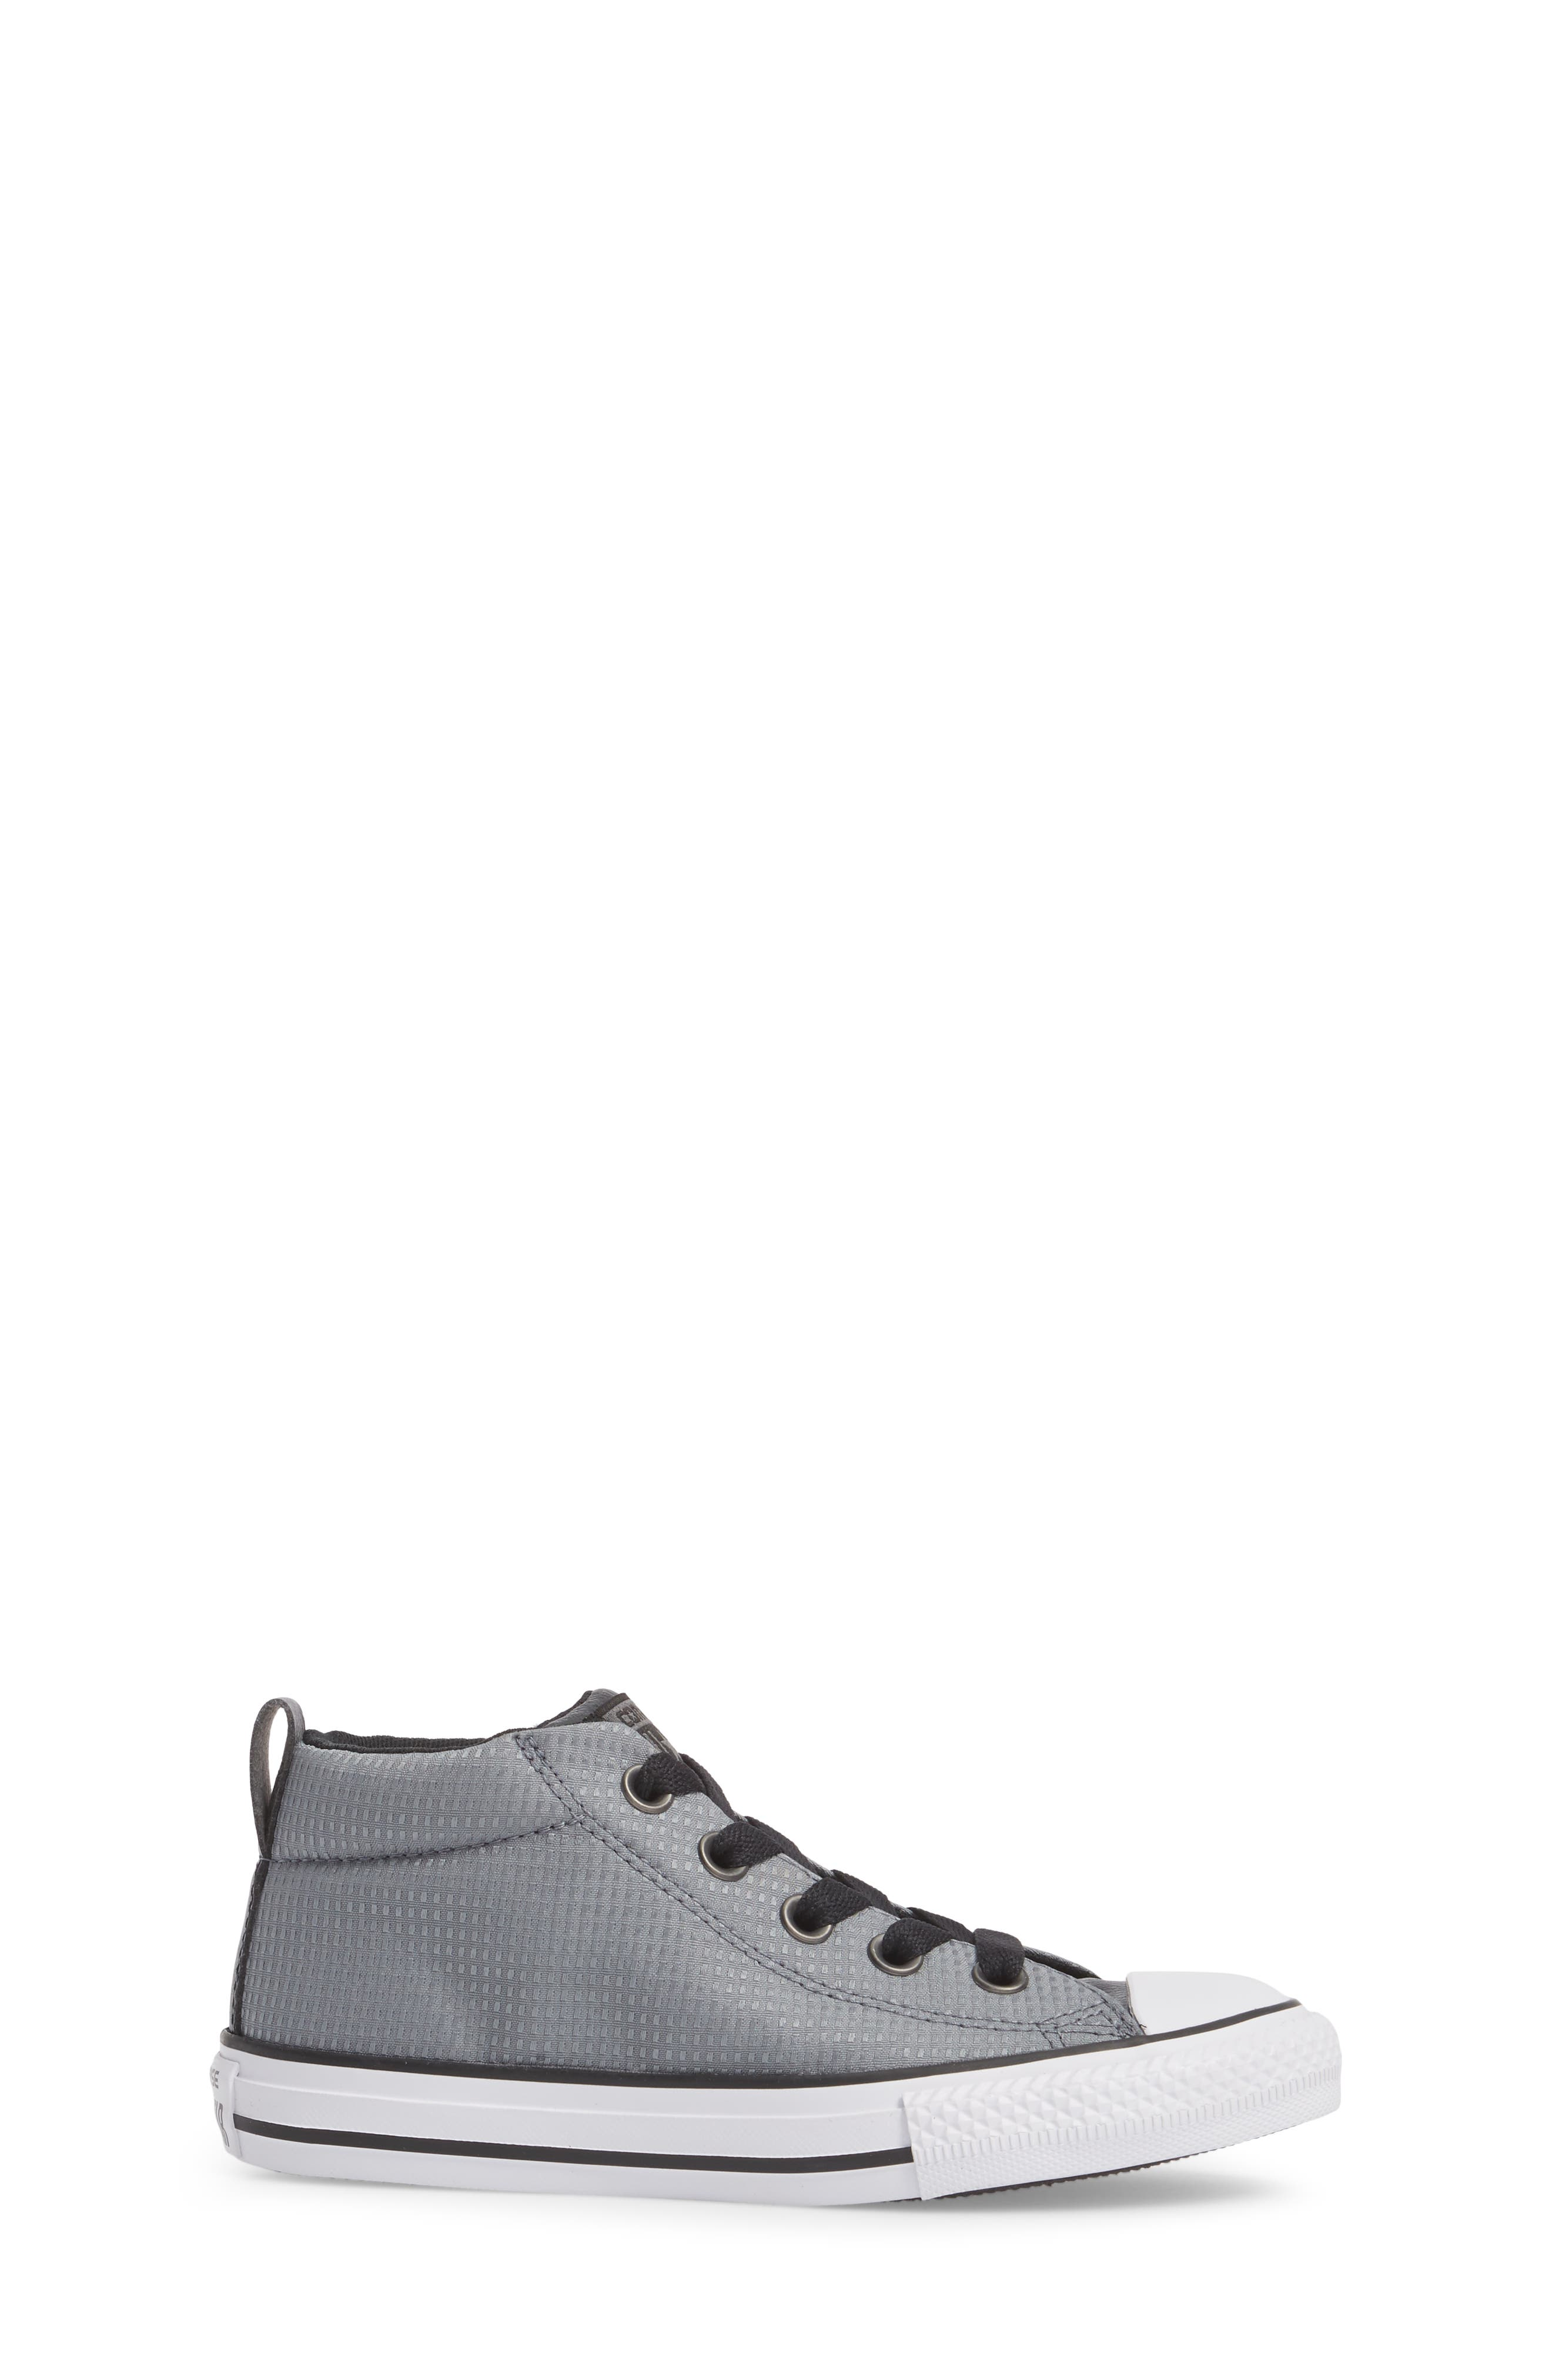 Alternate Image 3  - Converse Chuck Taylor® All Star® Street Mid Backpack Sneaker (Baby, Walker, Toddler, Little Kid & Big Kid)